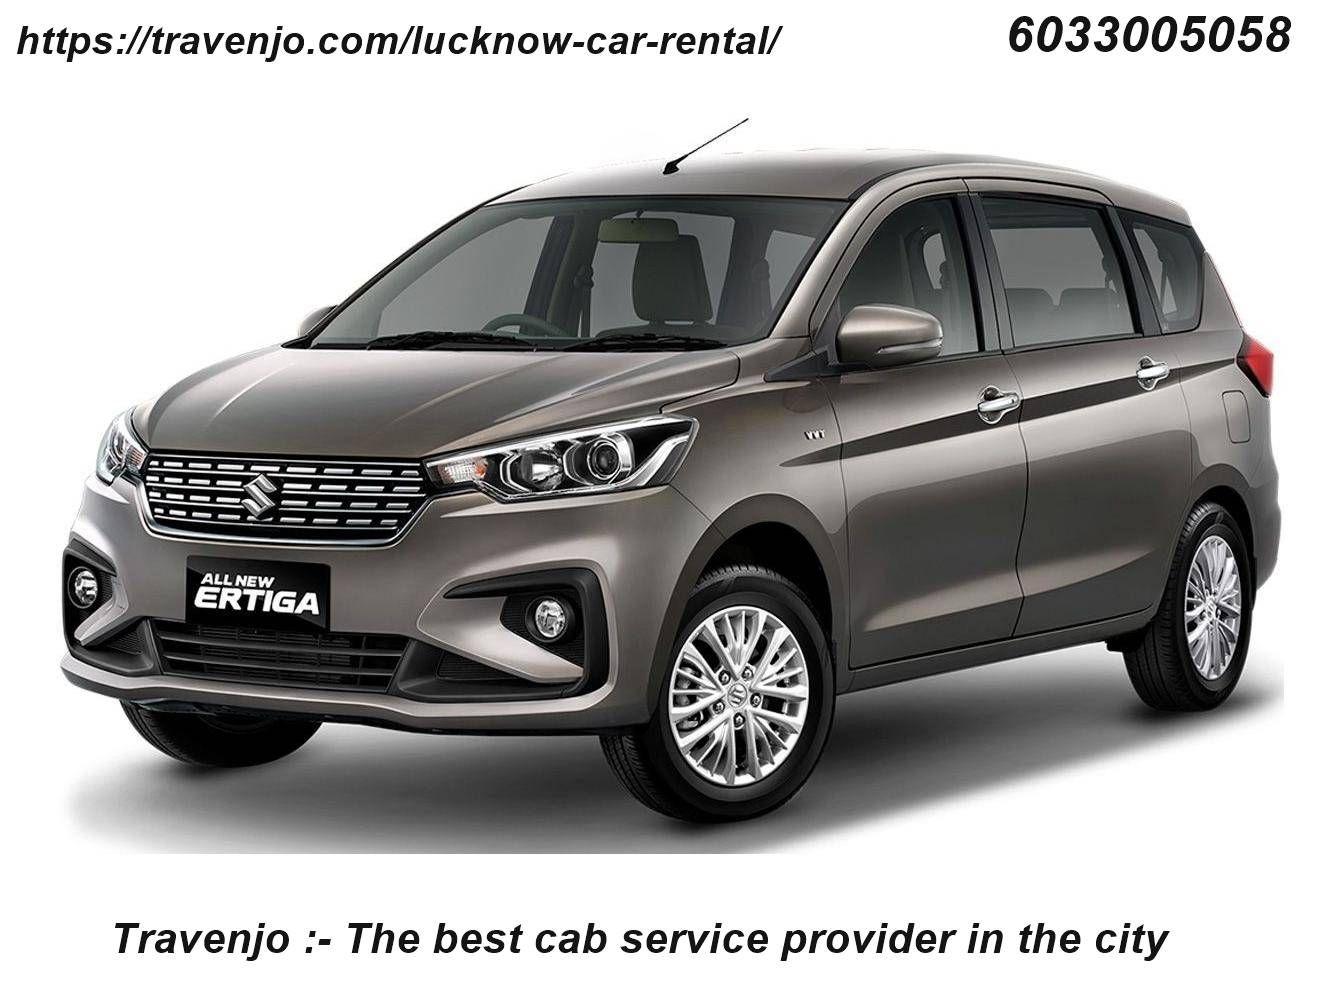 Lucknow Car Rentals Travenjo, Lucknow Car Hire Cheapest